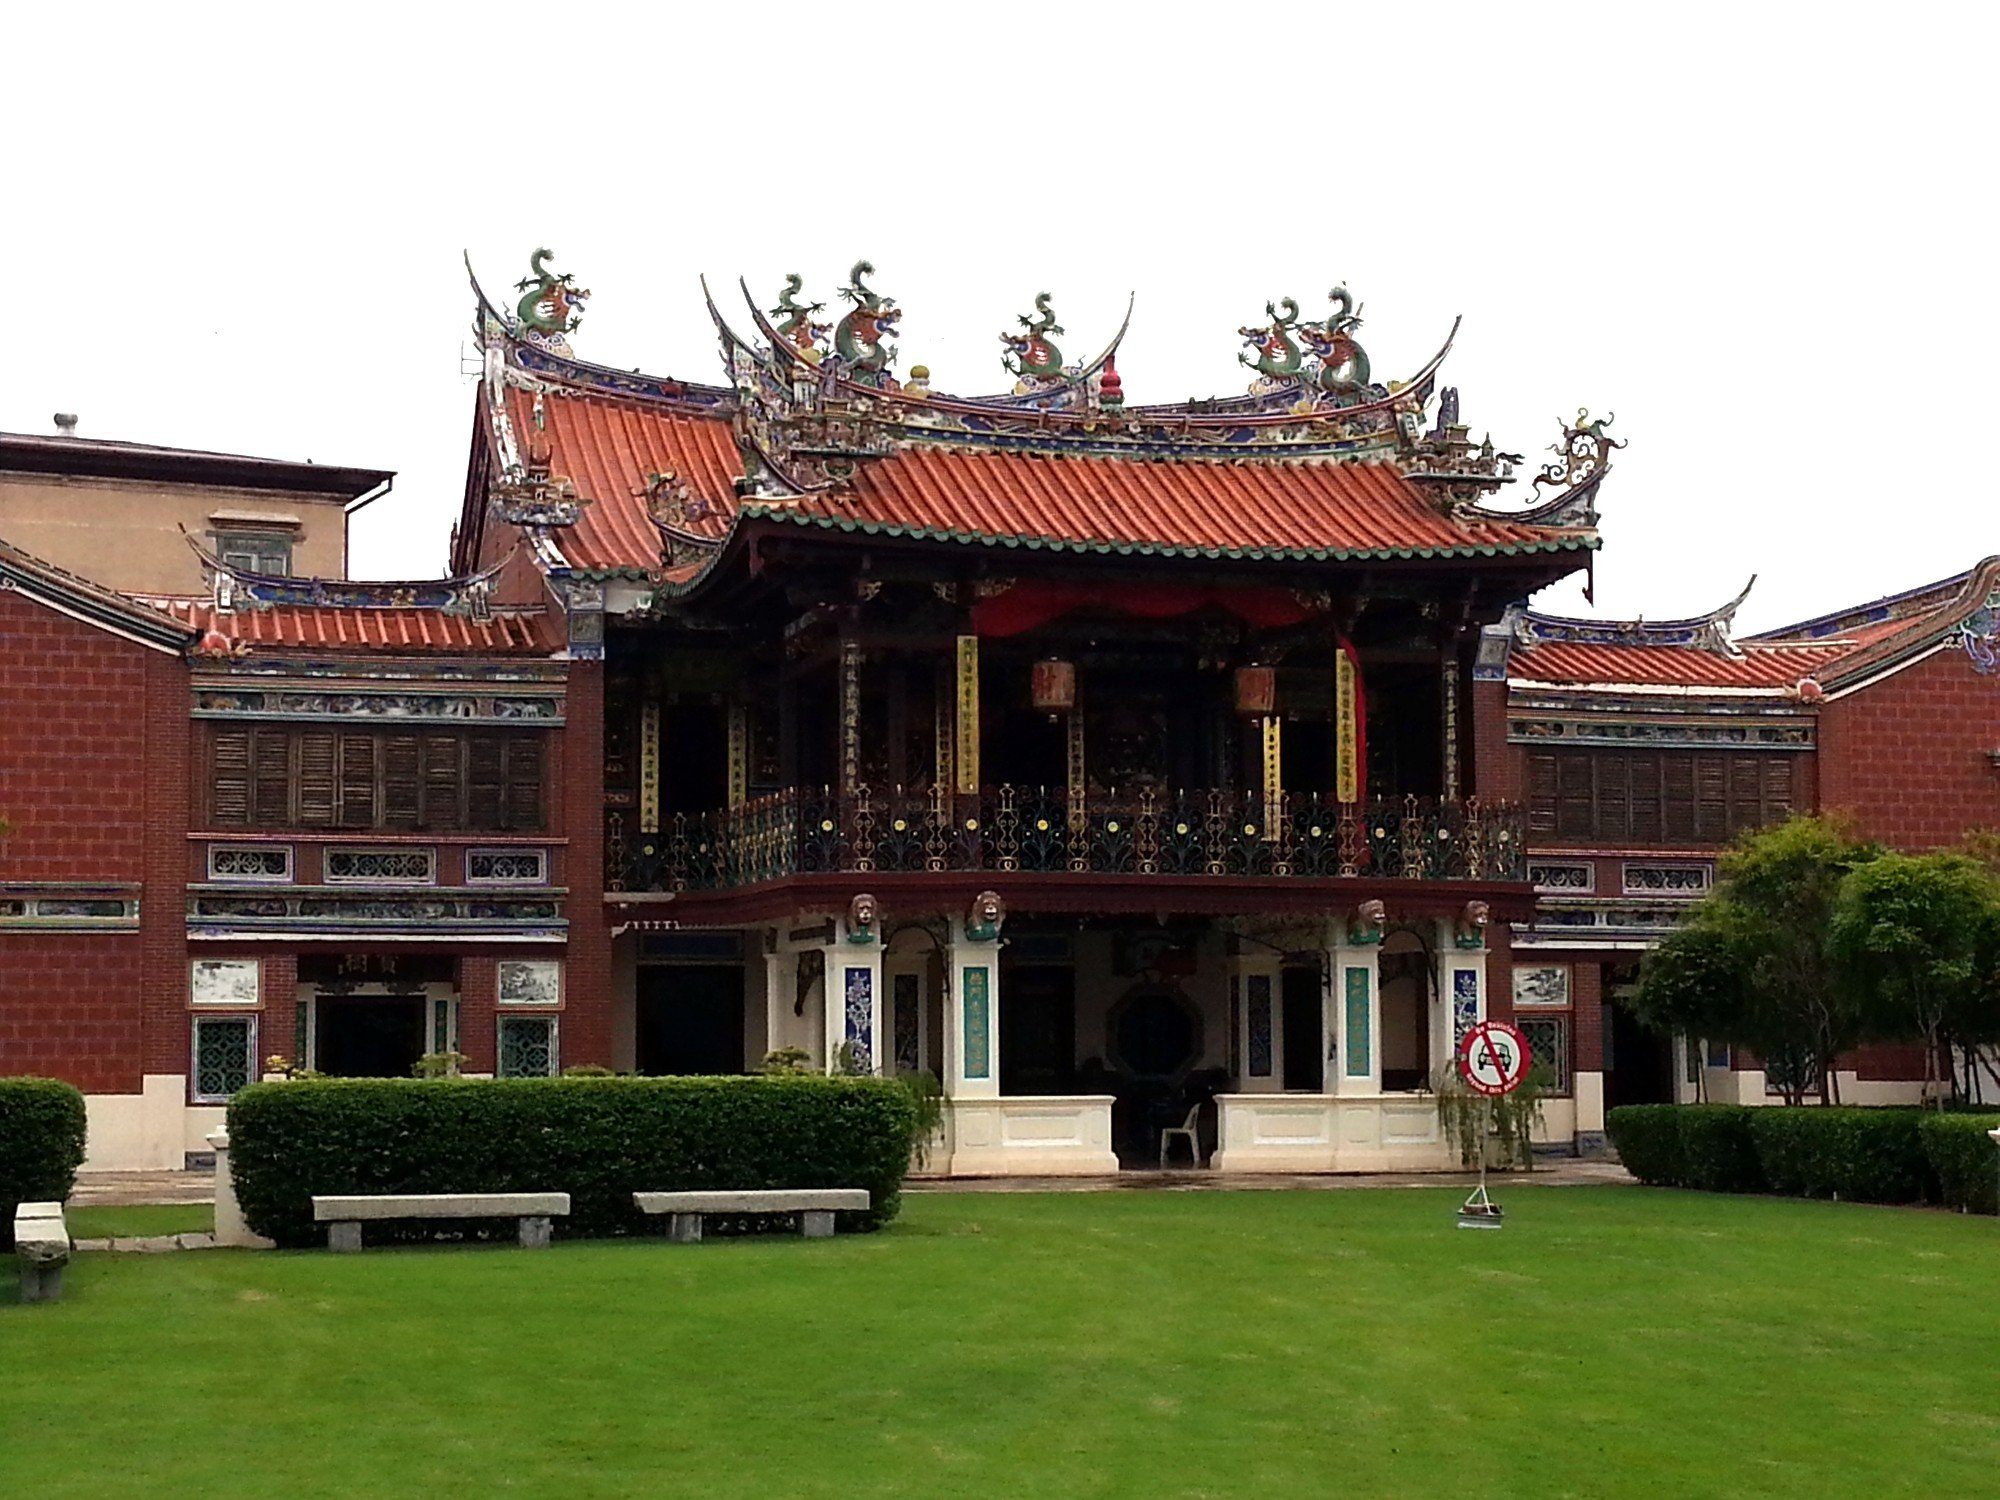 Cheah Kongsi in historic George Town